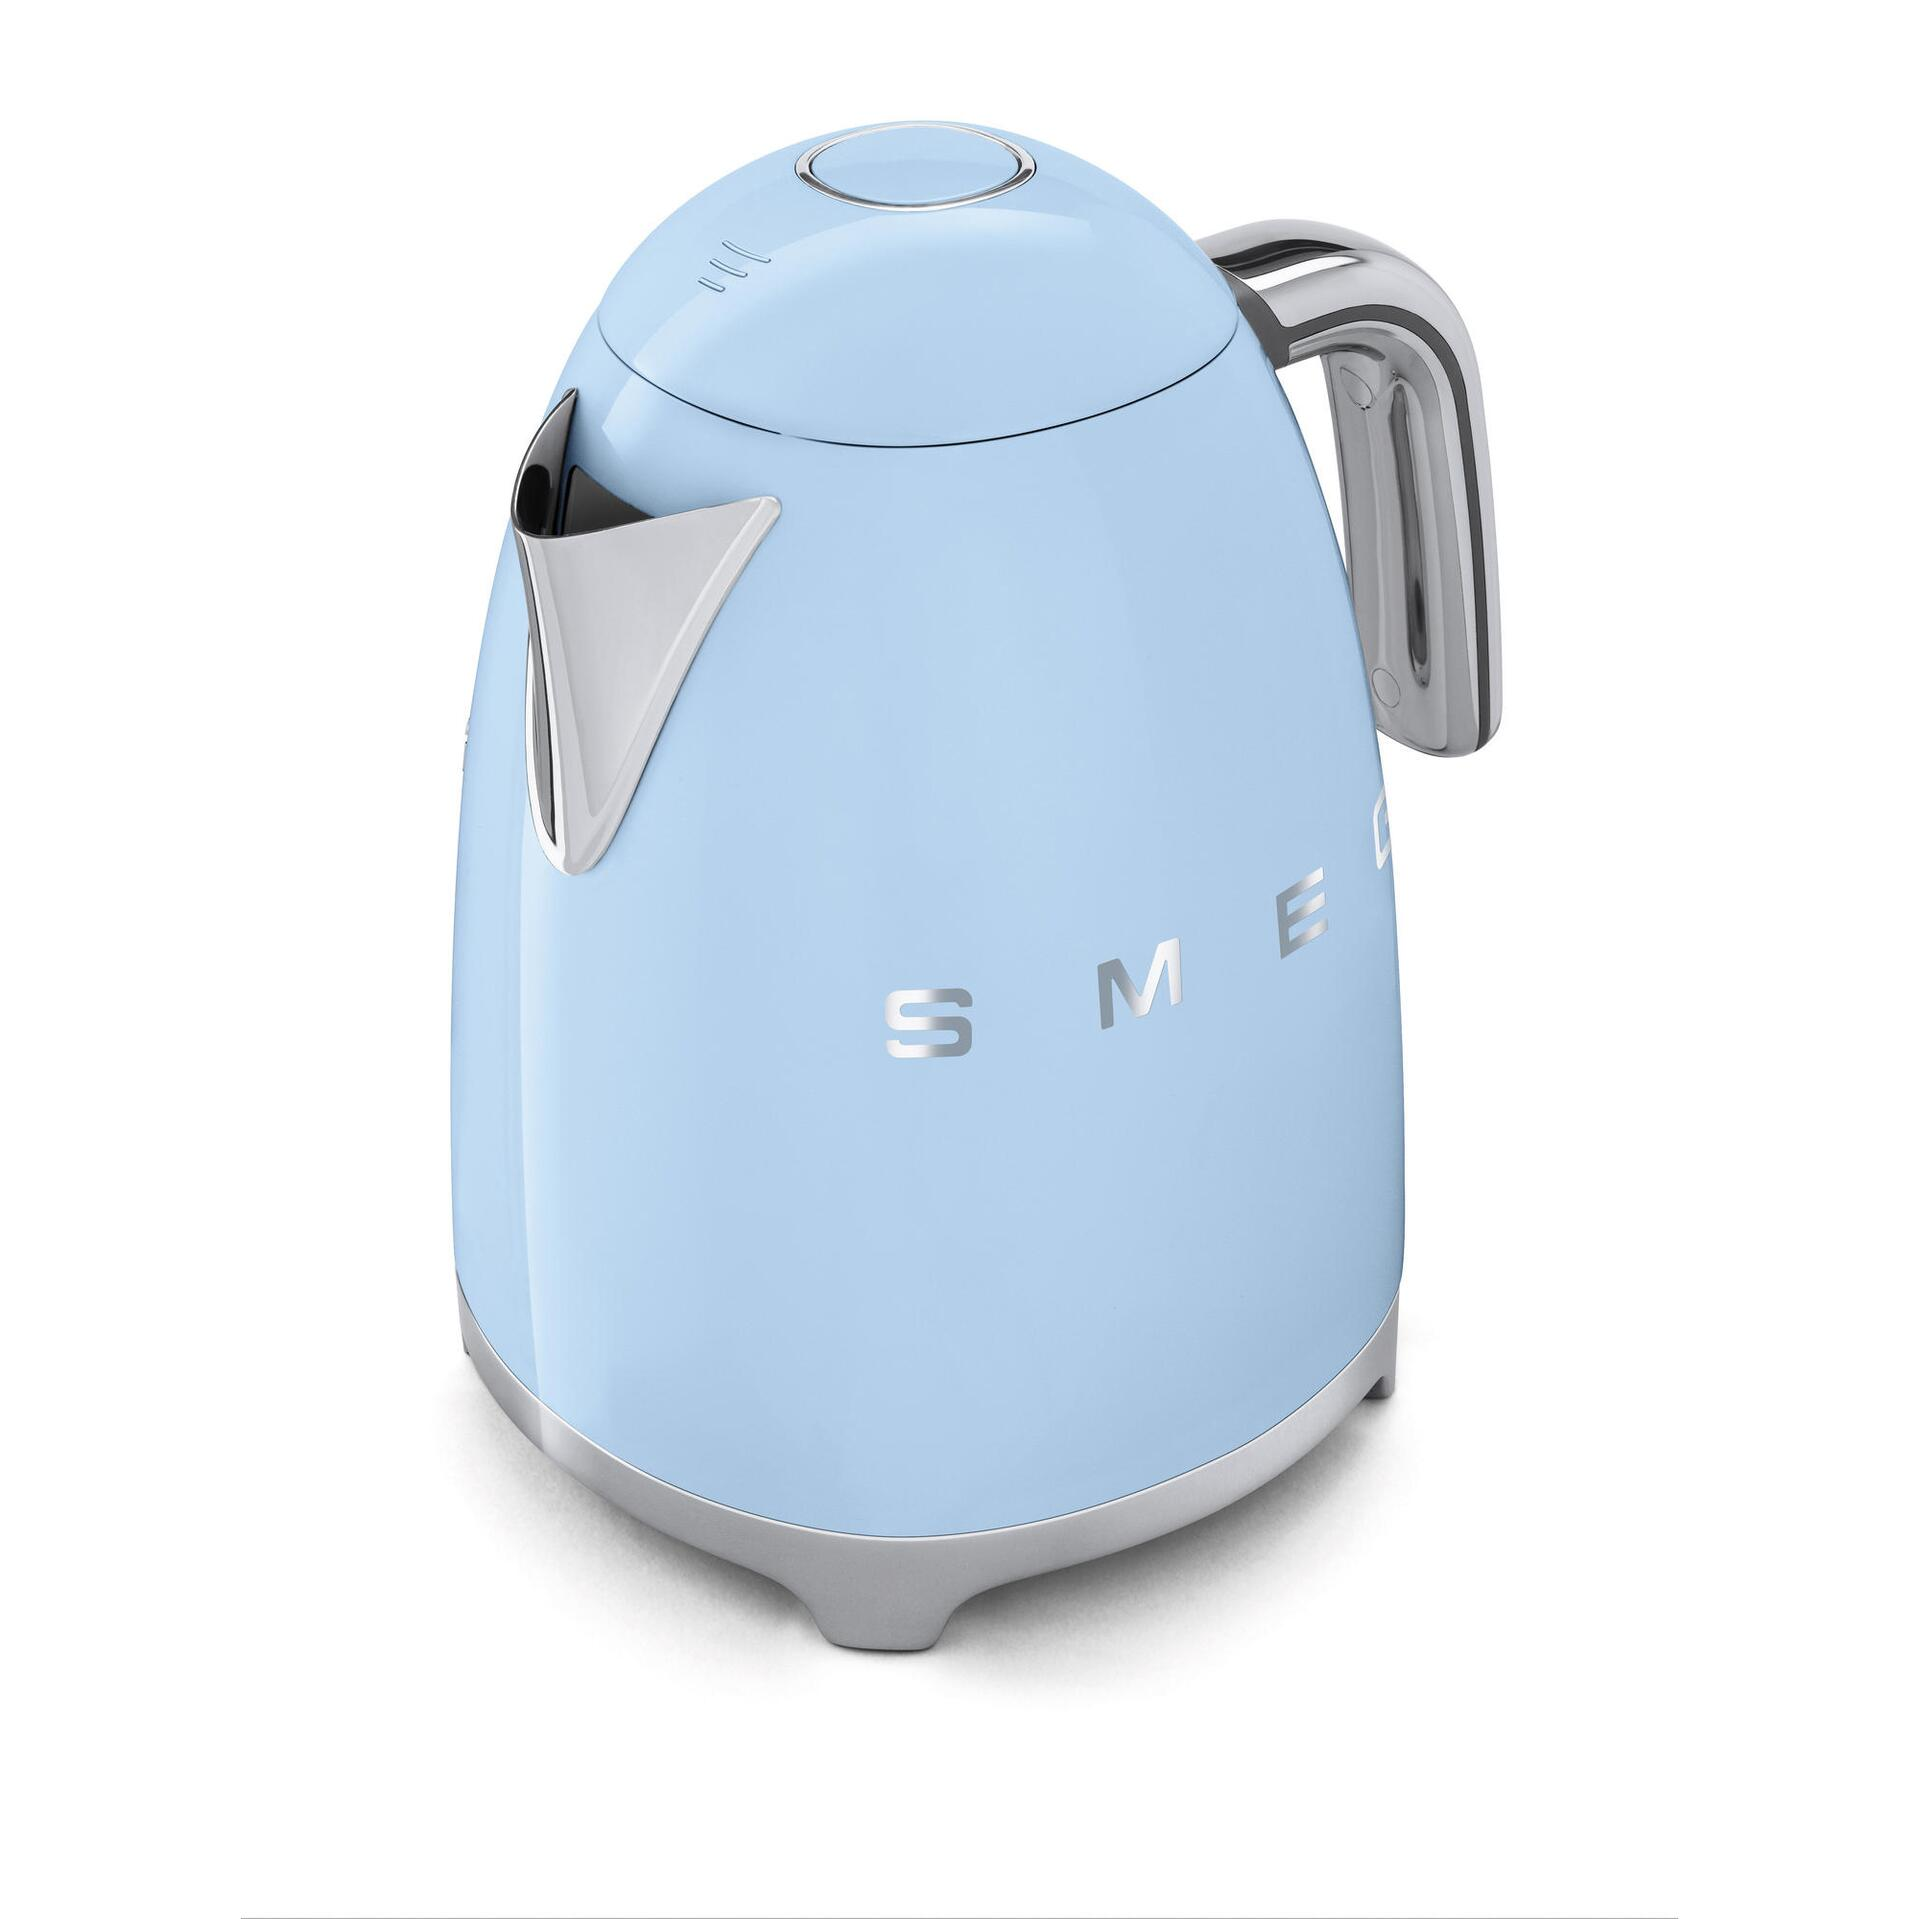 Smeg Retro Wasserkocher 1,7 Liter Pastellblau